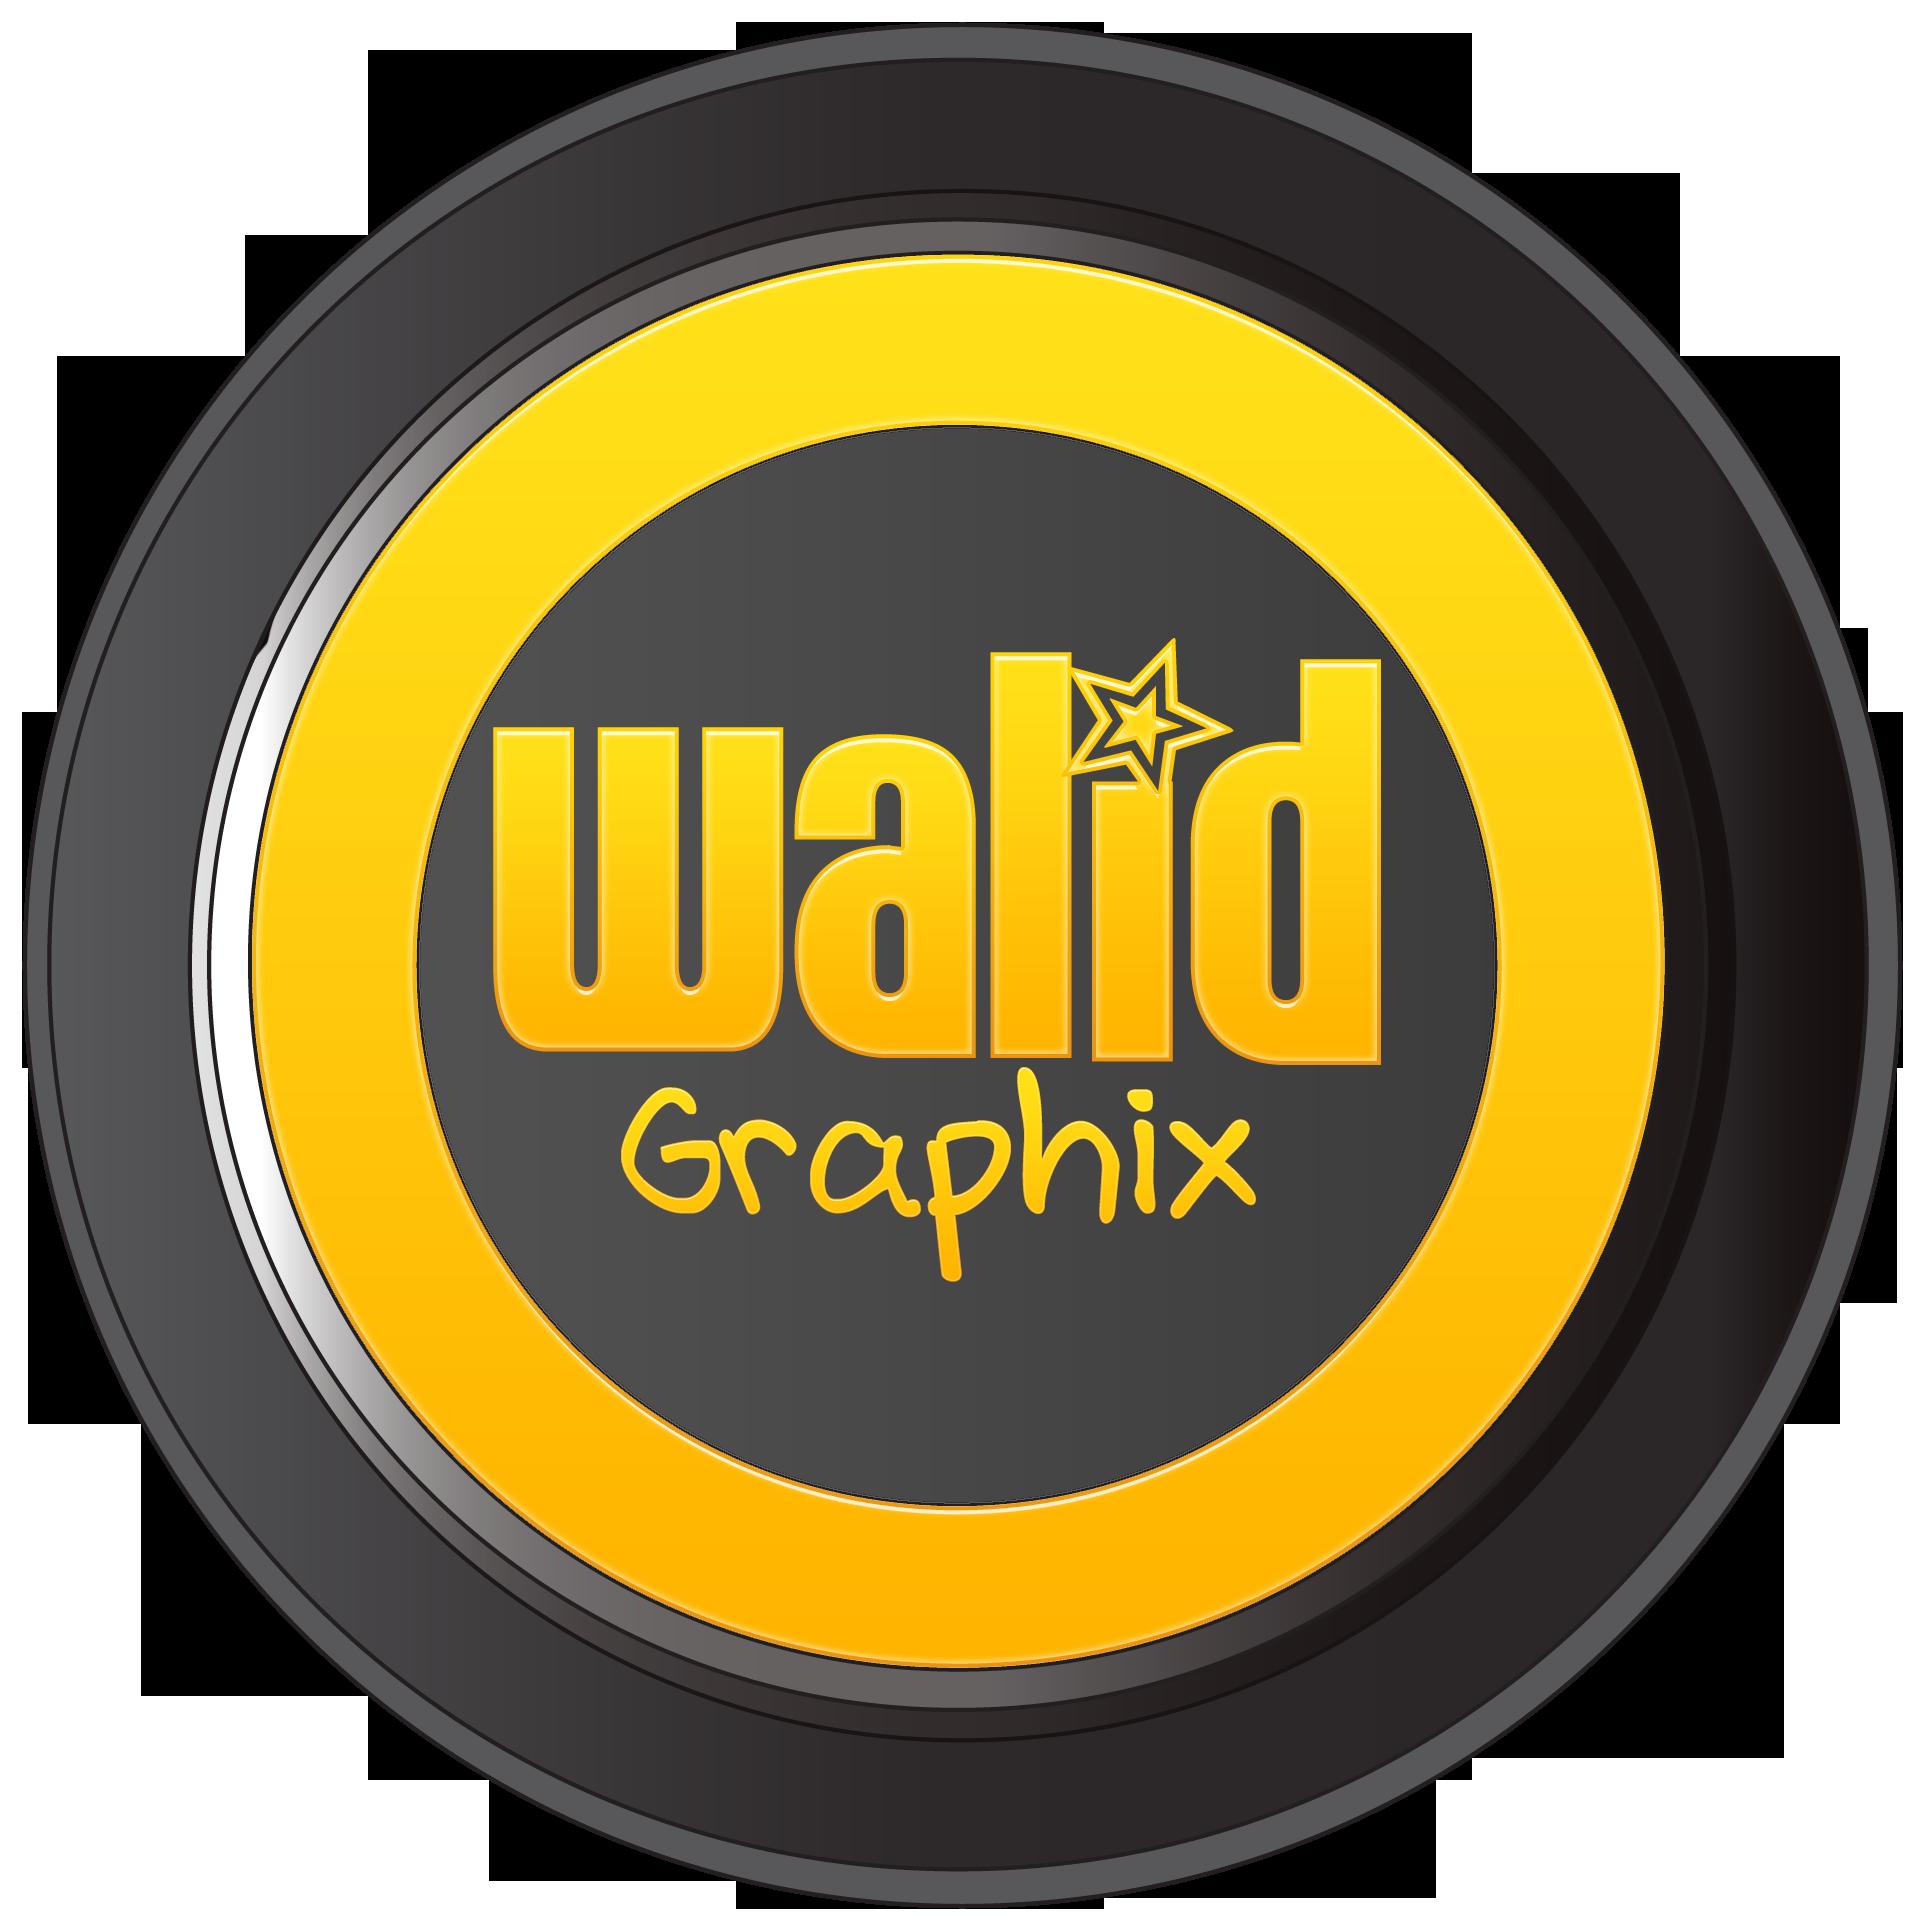 Walid GFX by WalidGFX on DeviantArt